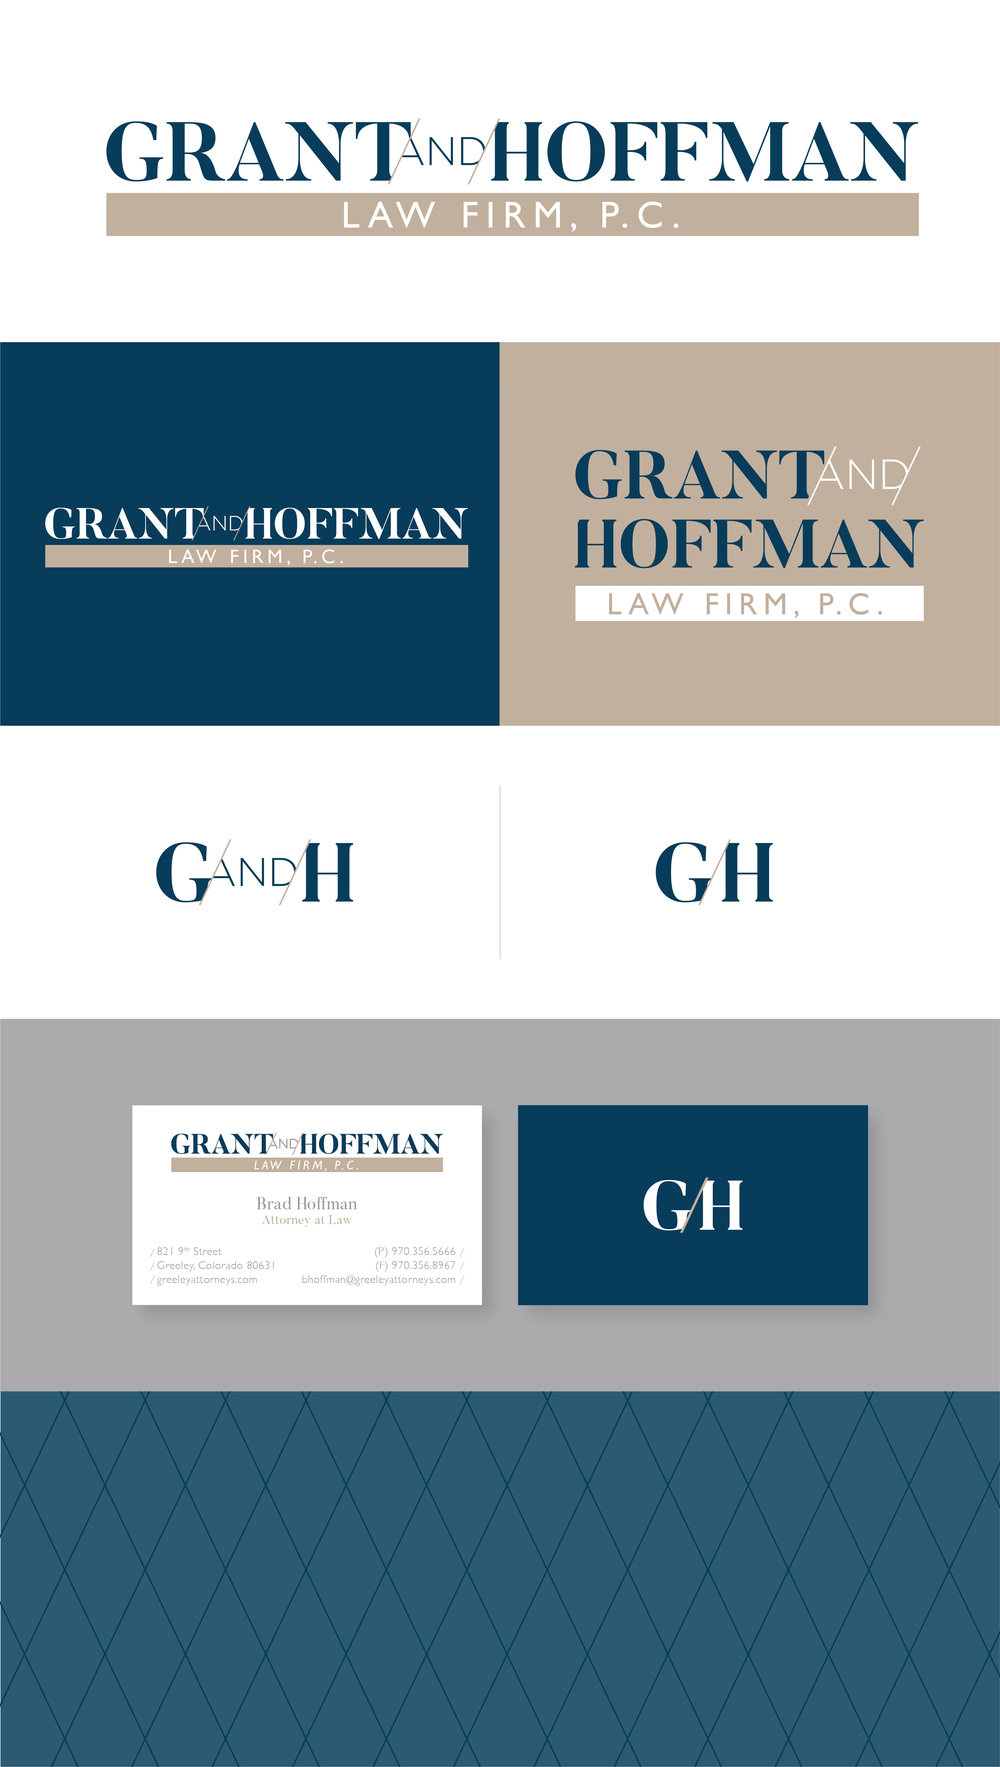 G&H_FirstLook-02.jpg